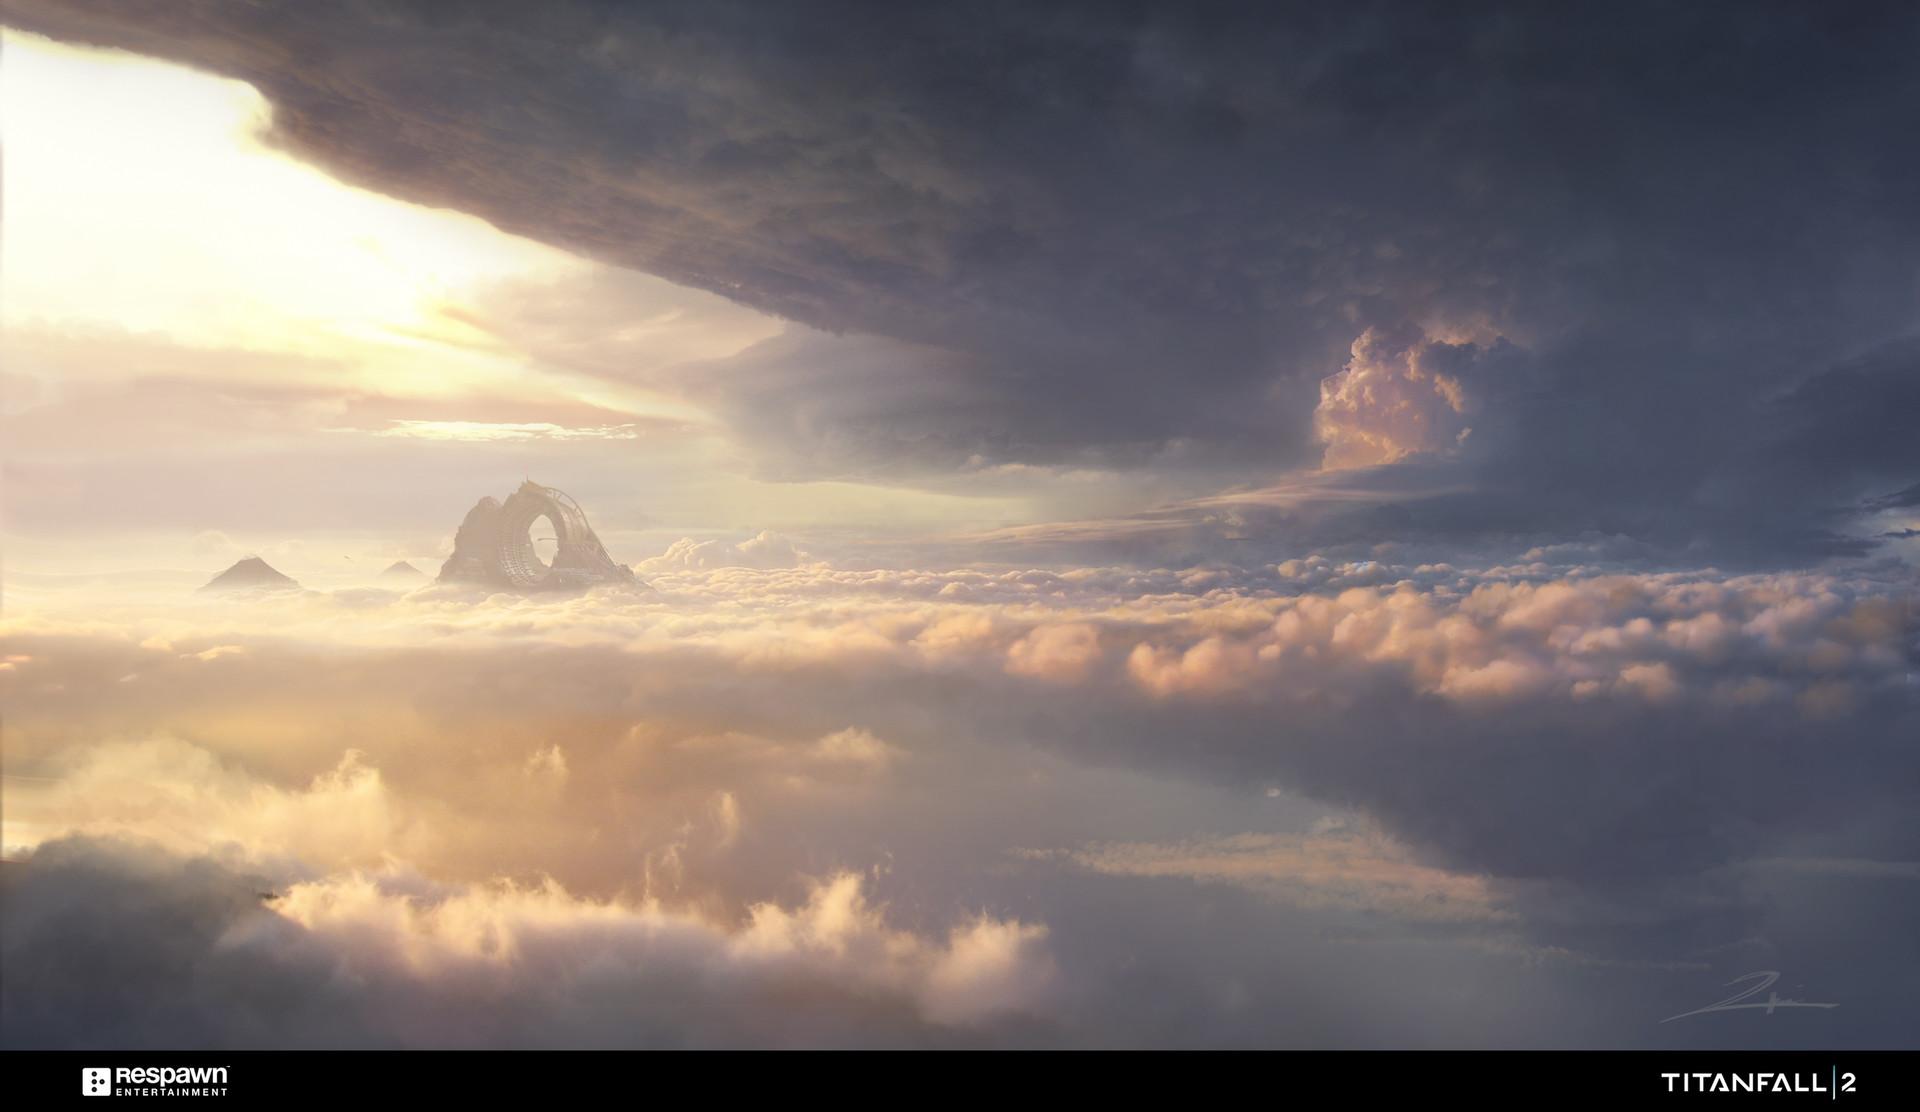 Tu bui wild drop abover clouds